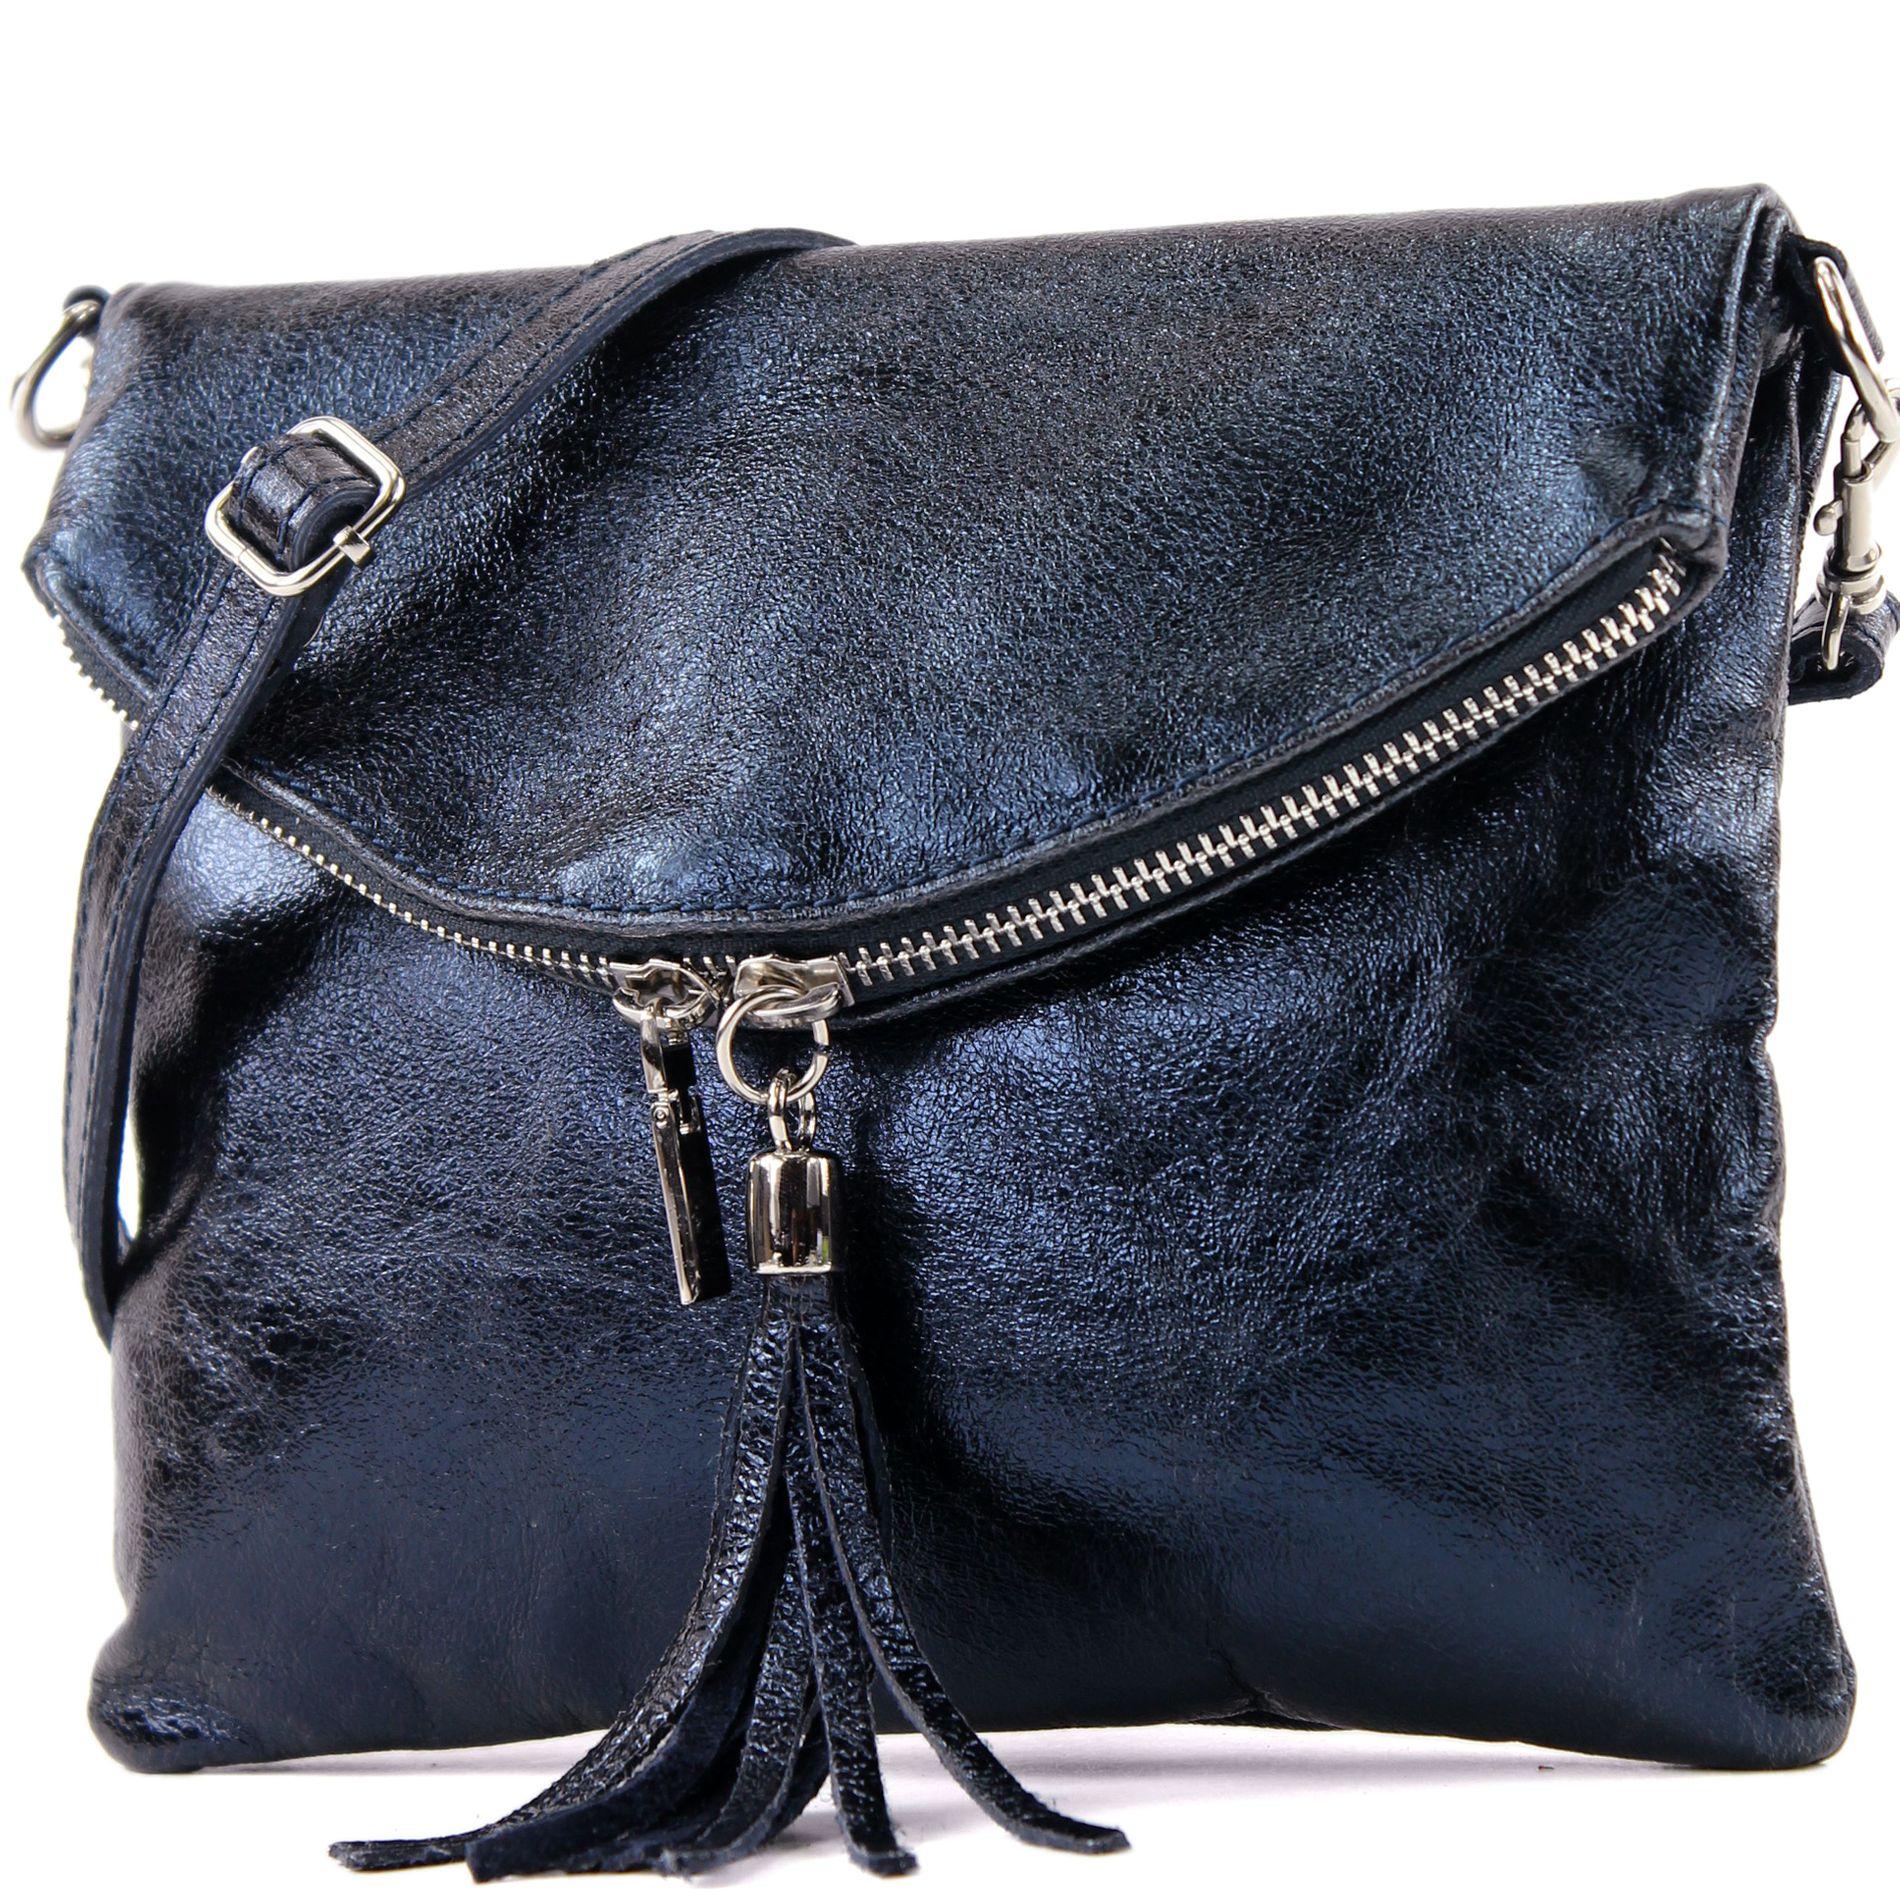 c50709d6bf Leather Clutch Shoulder Bag Underarm Shoulder Bag Girl Small Nappa Leather  T139